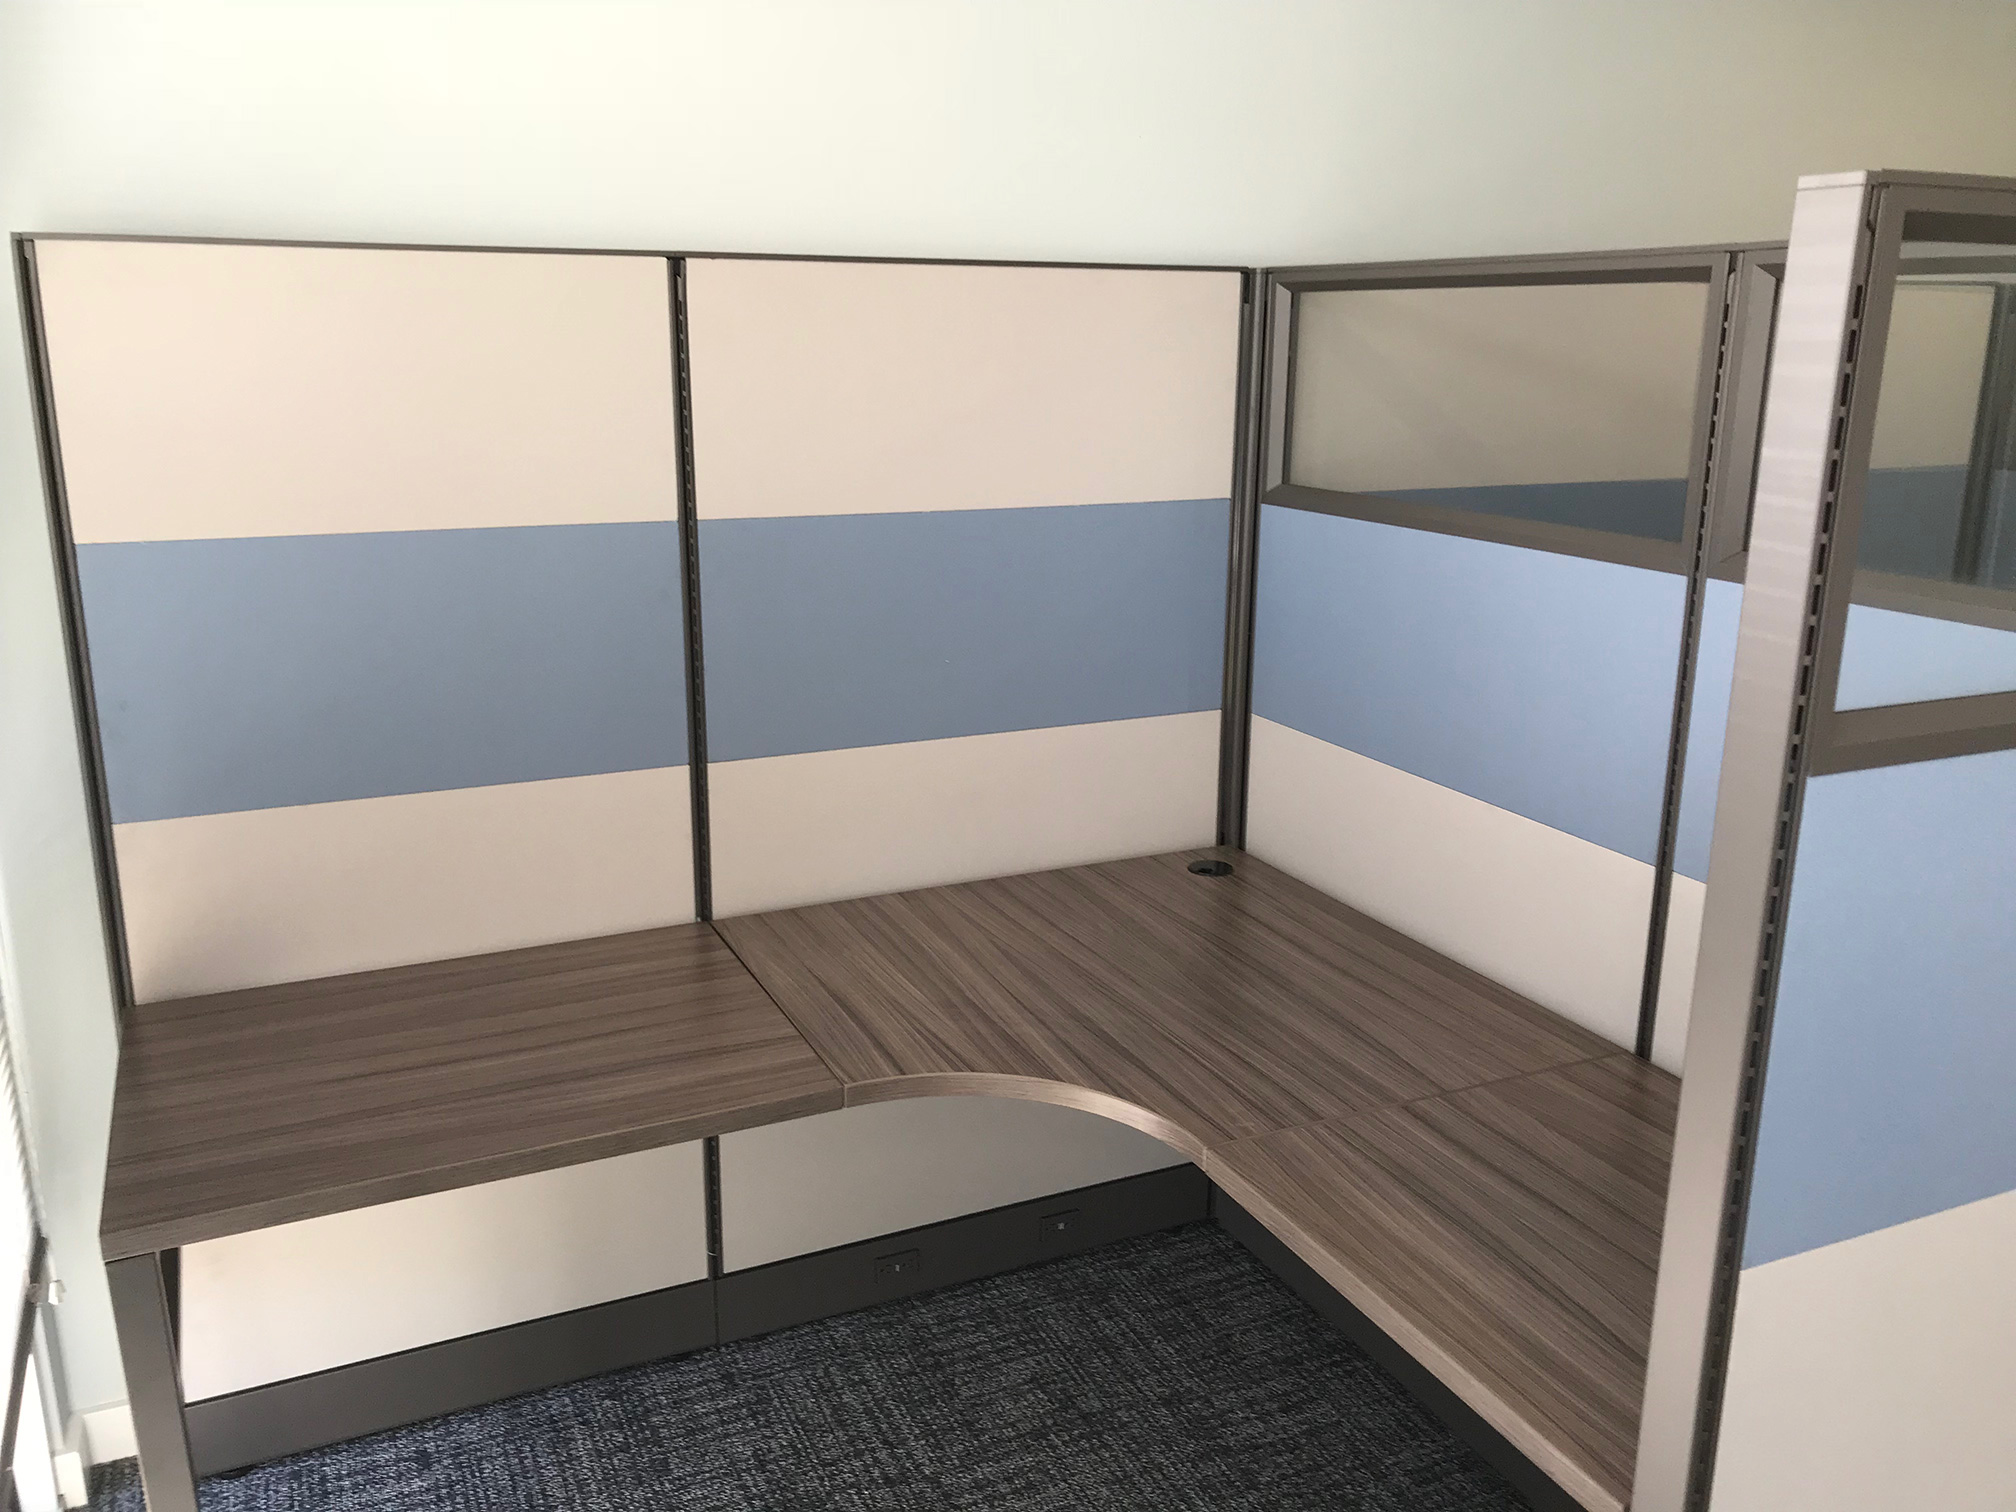 cubicles-manasota-office-supplies-llc.jpg